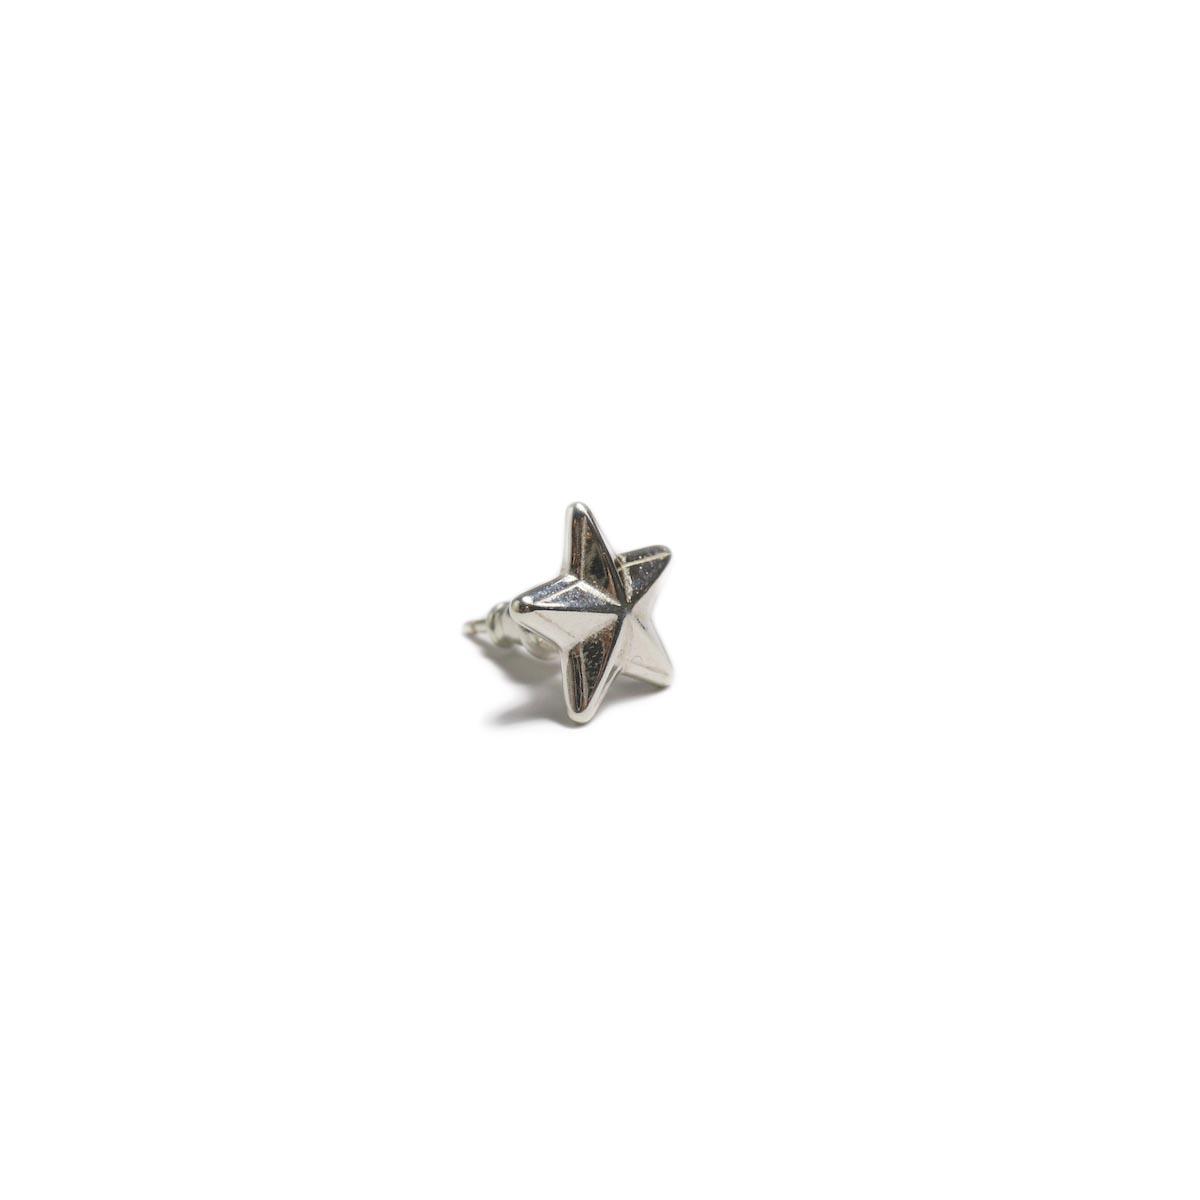 END / Rim Star Pierce